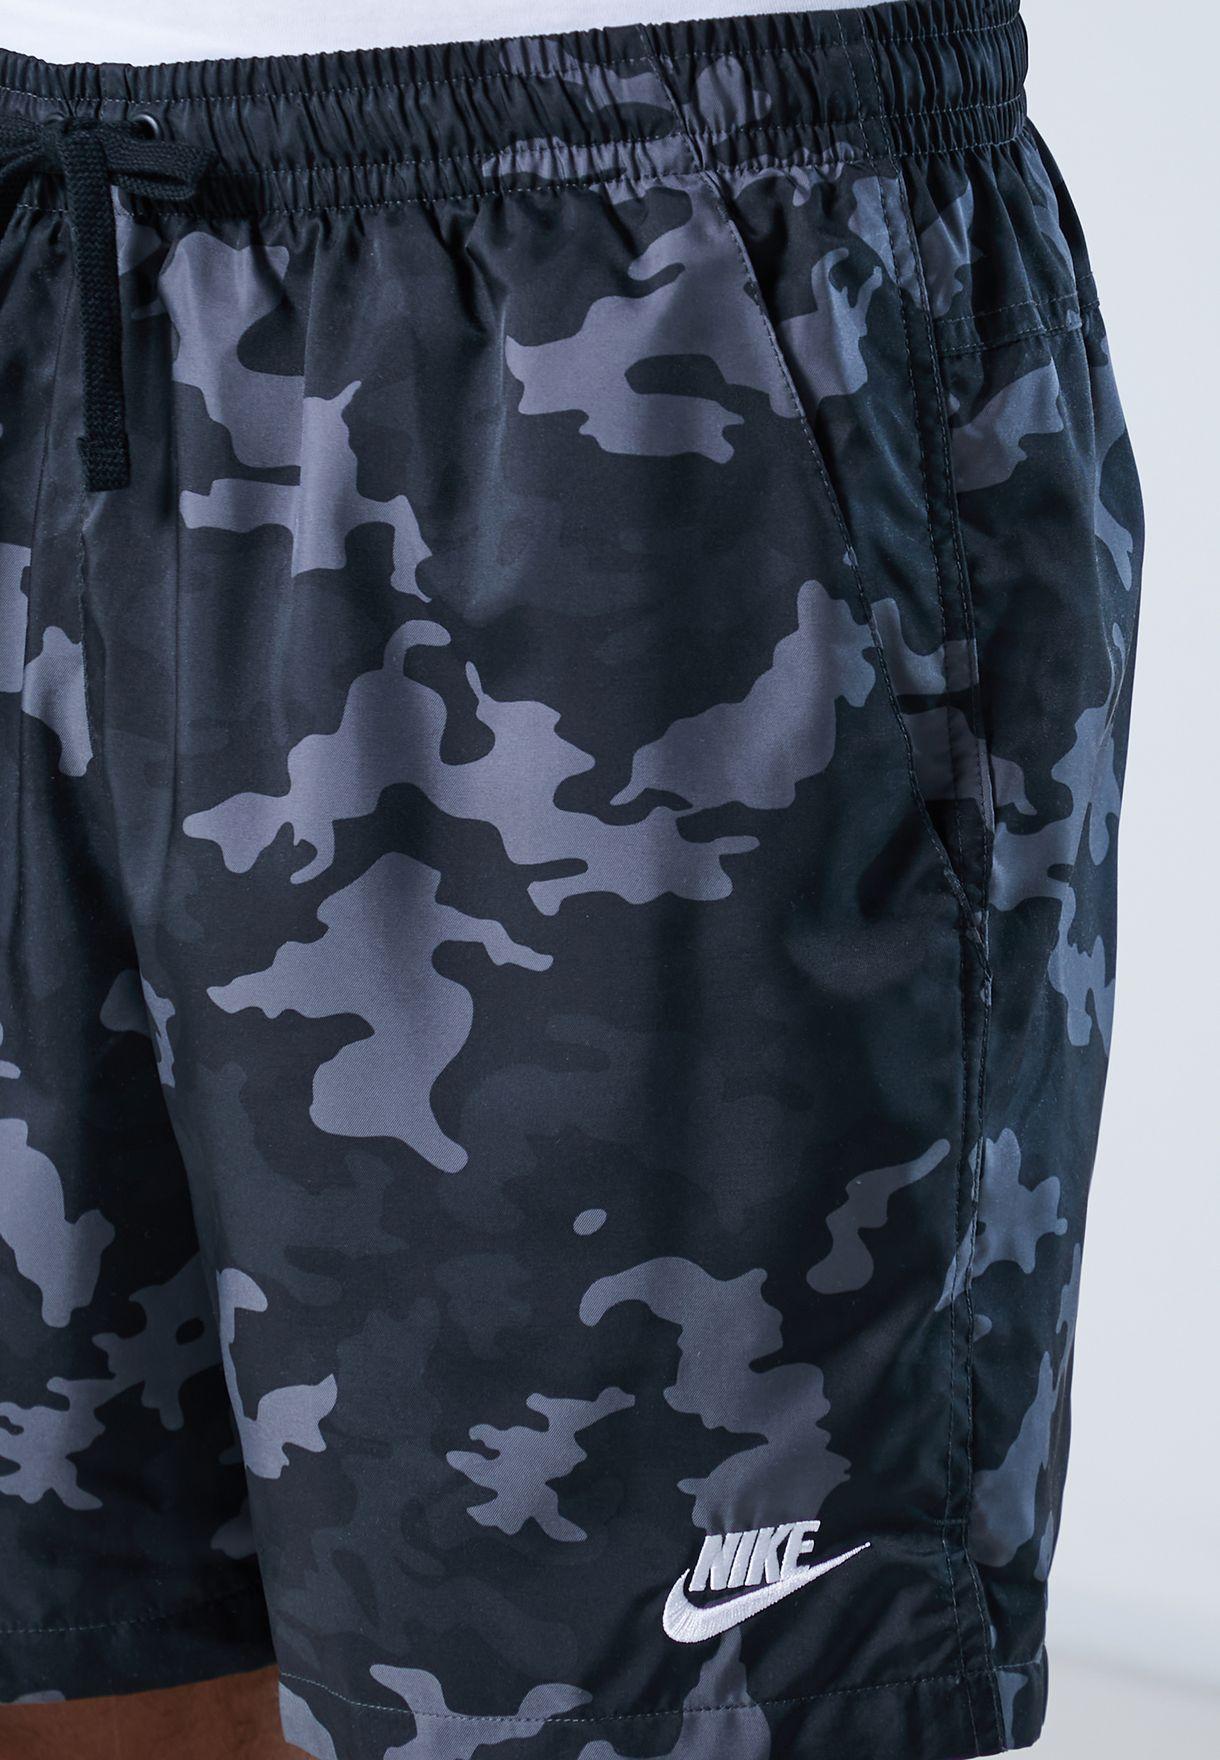 NSW Flow Camo Woven Shorts